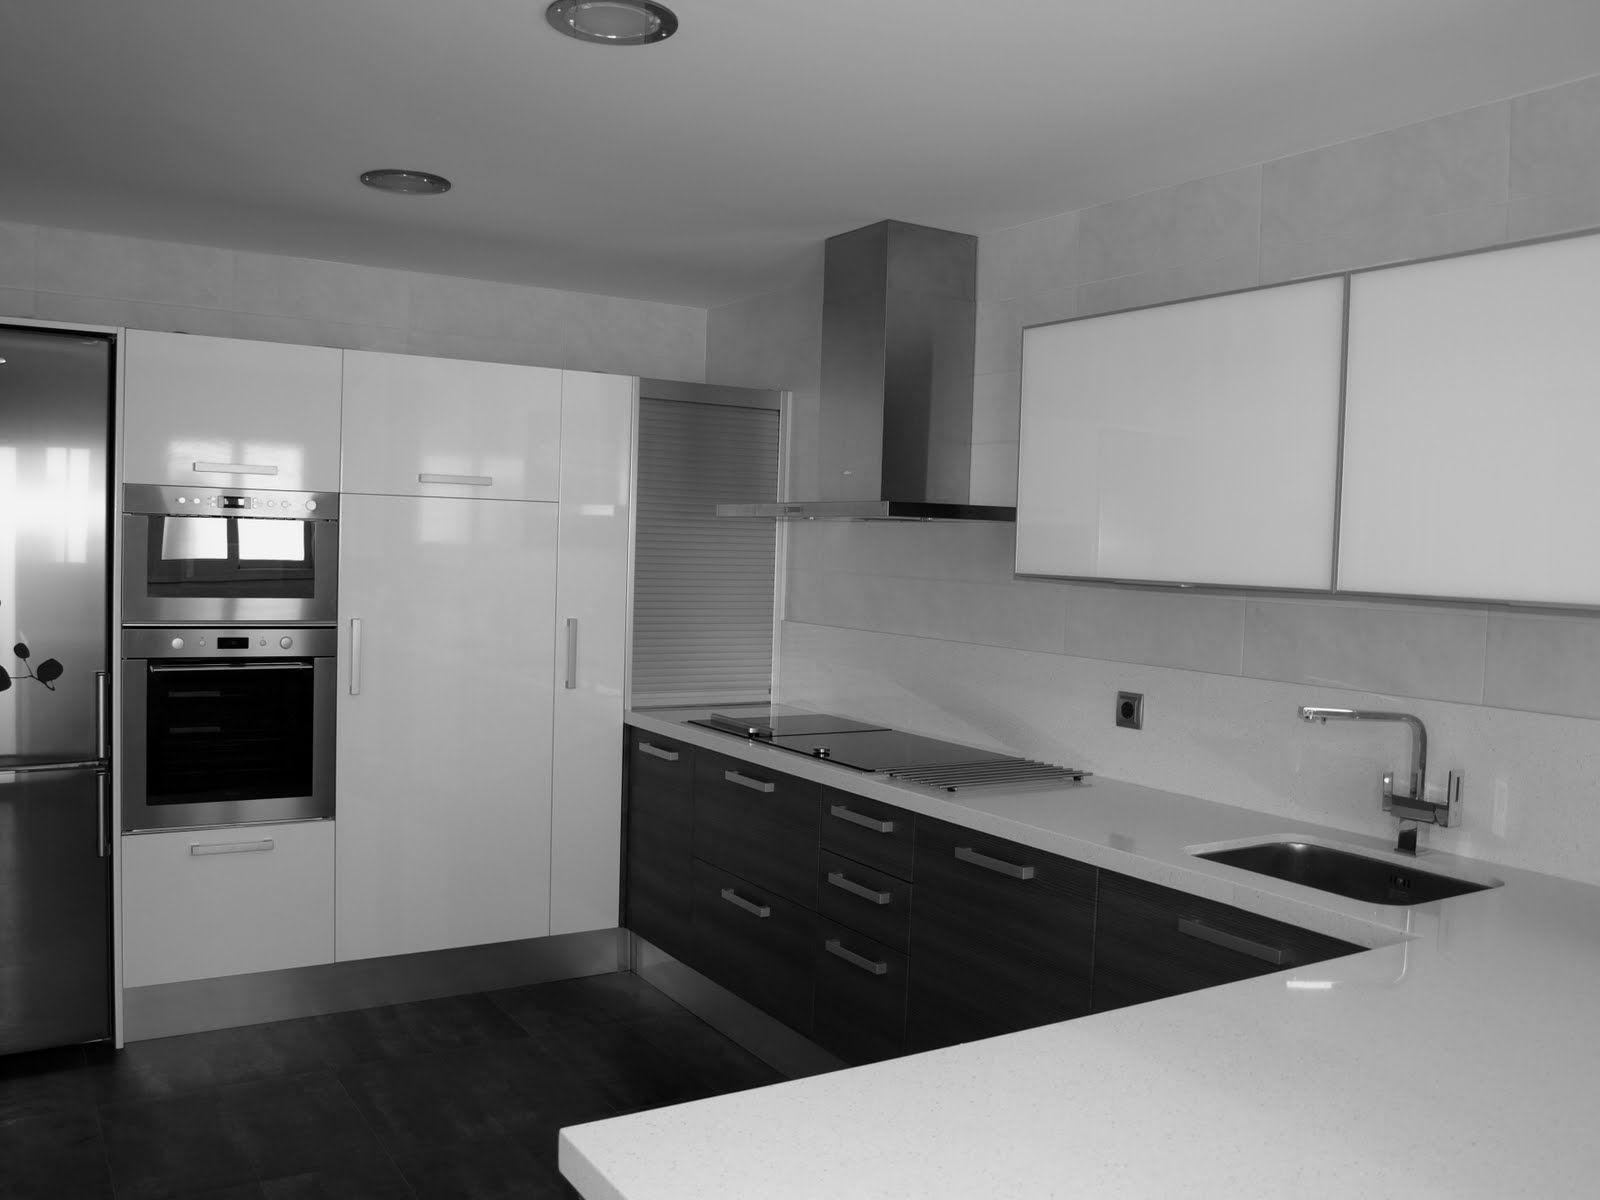 Cocina blanca suelo gris inspiraci n de dise o de - Suelos para cocinas blancas ...